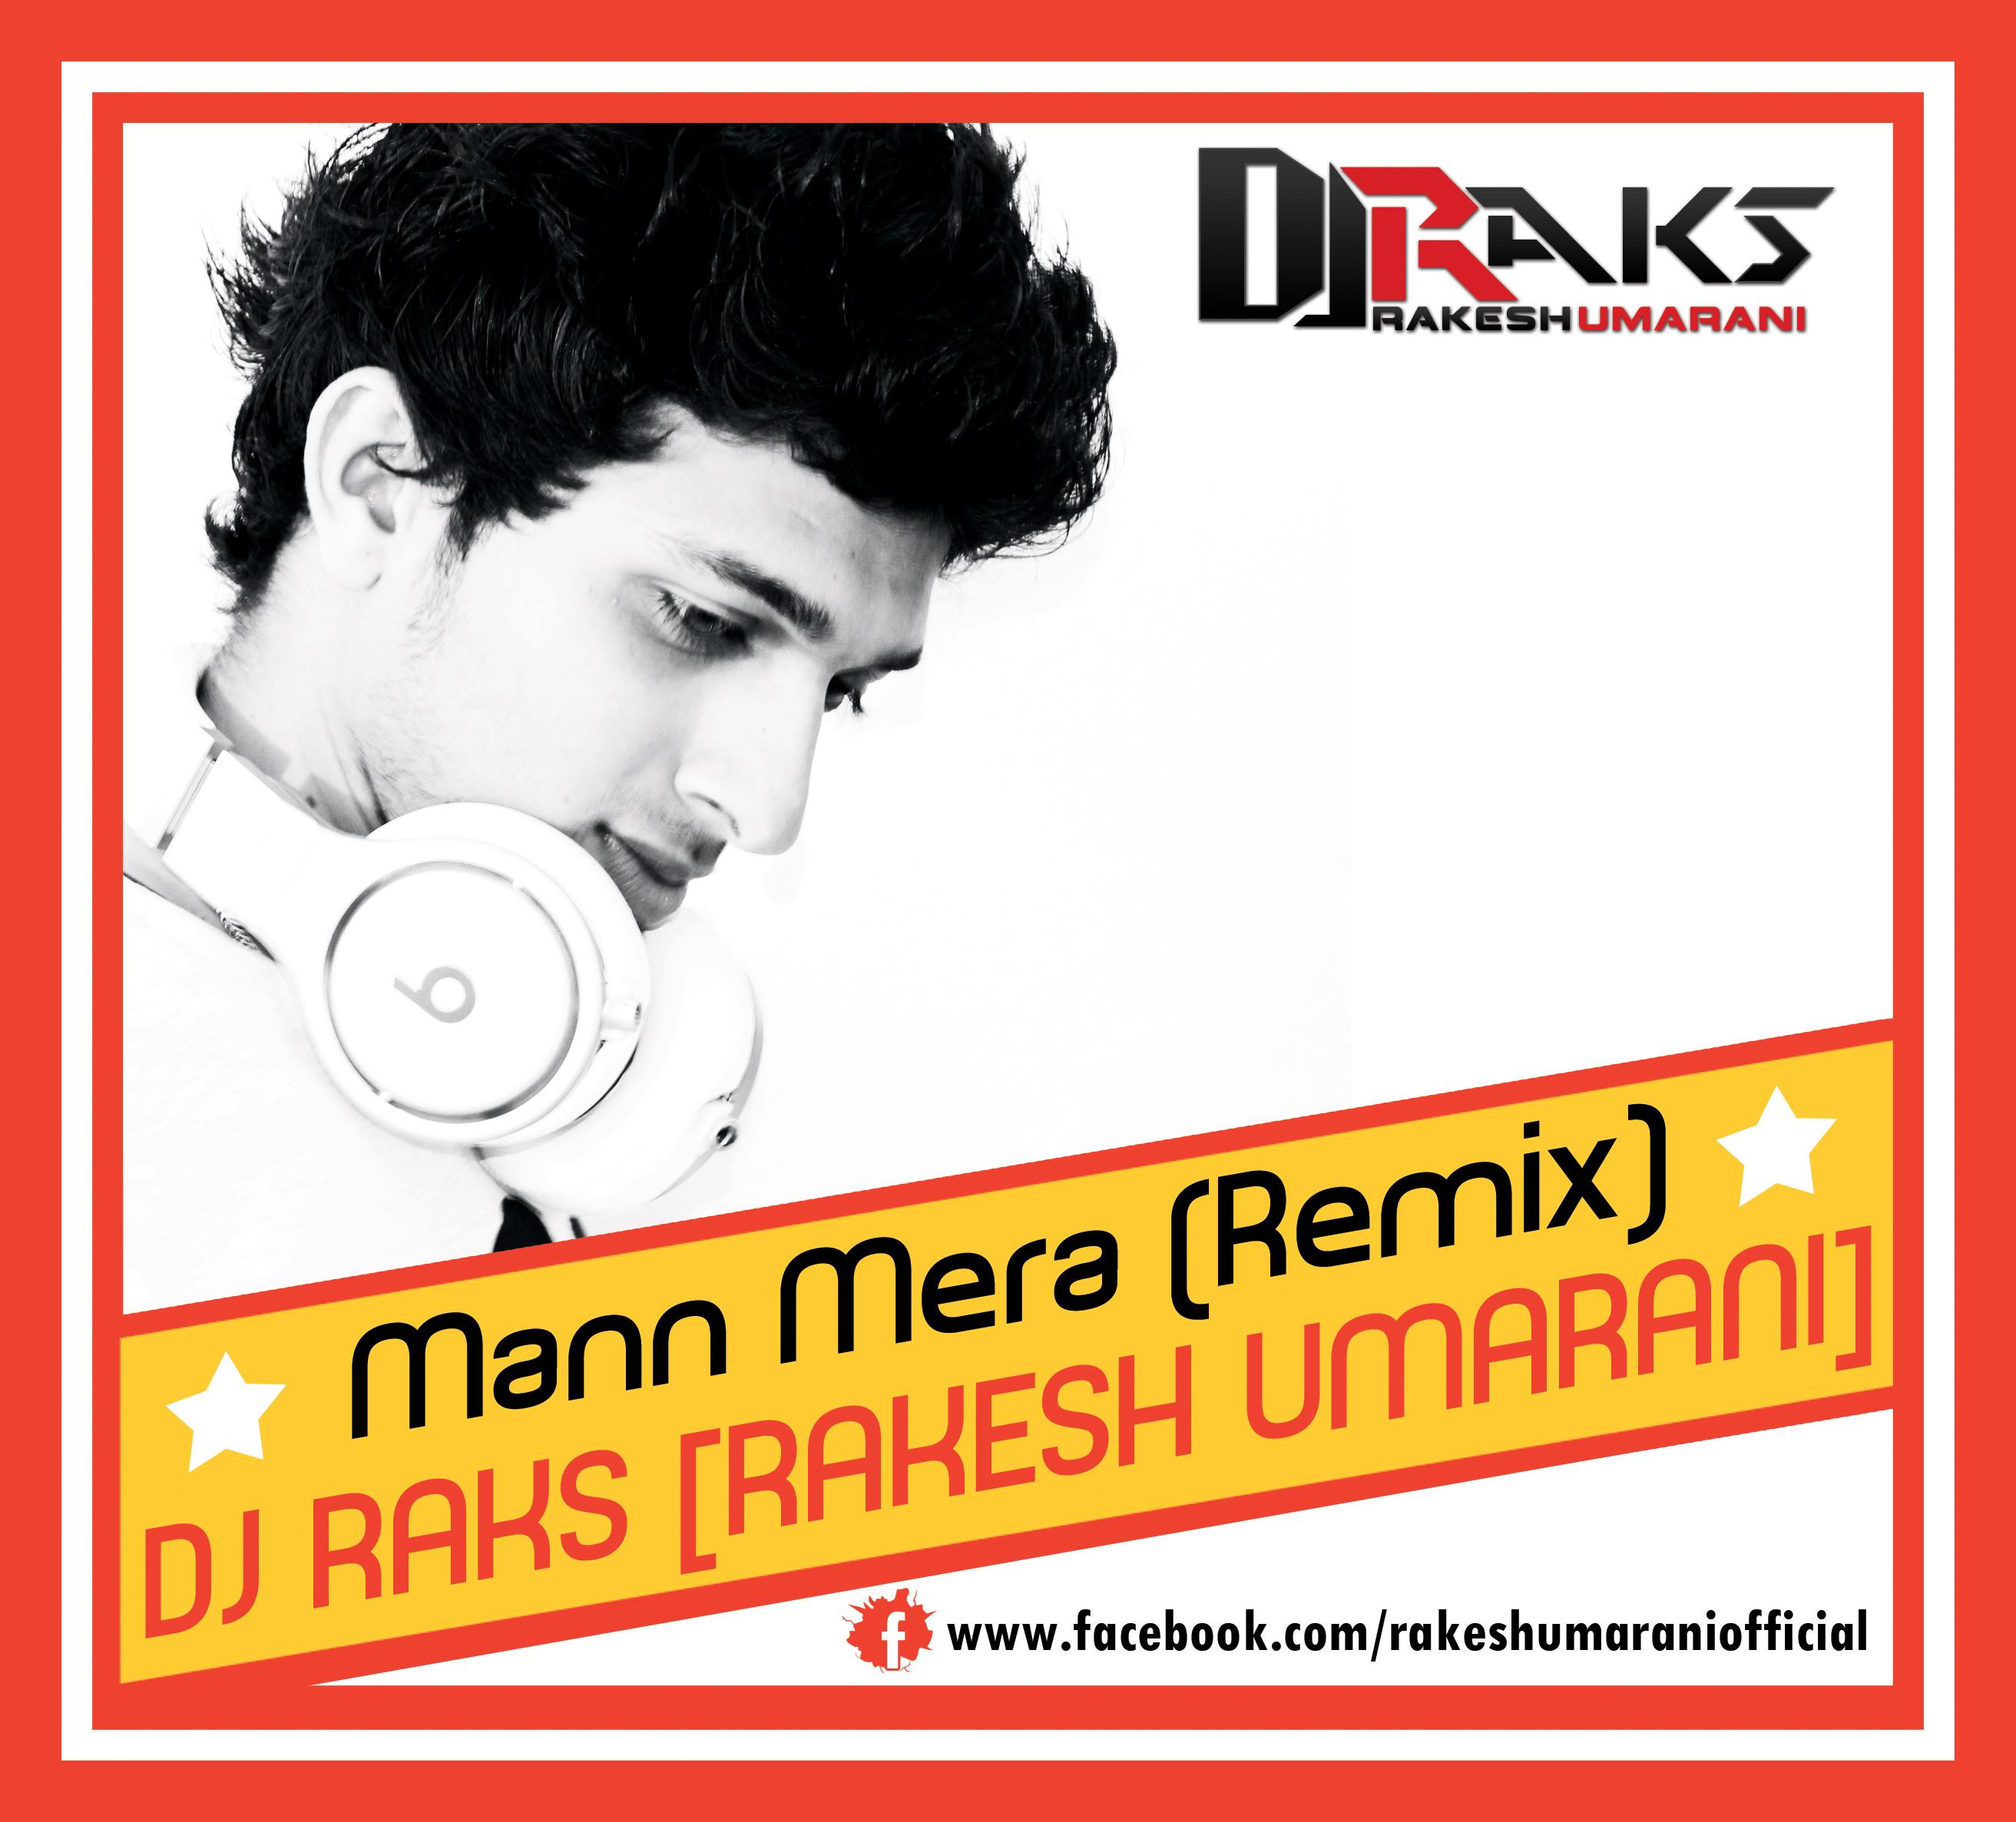 Mann-Mera-DJ-Raks